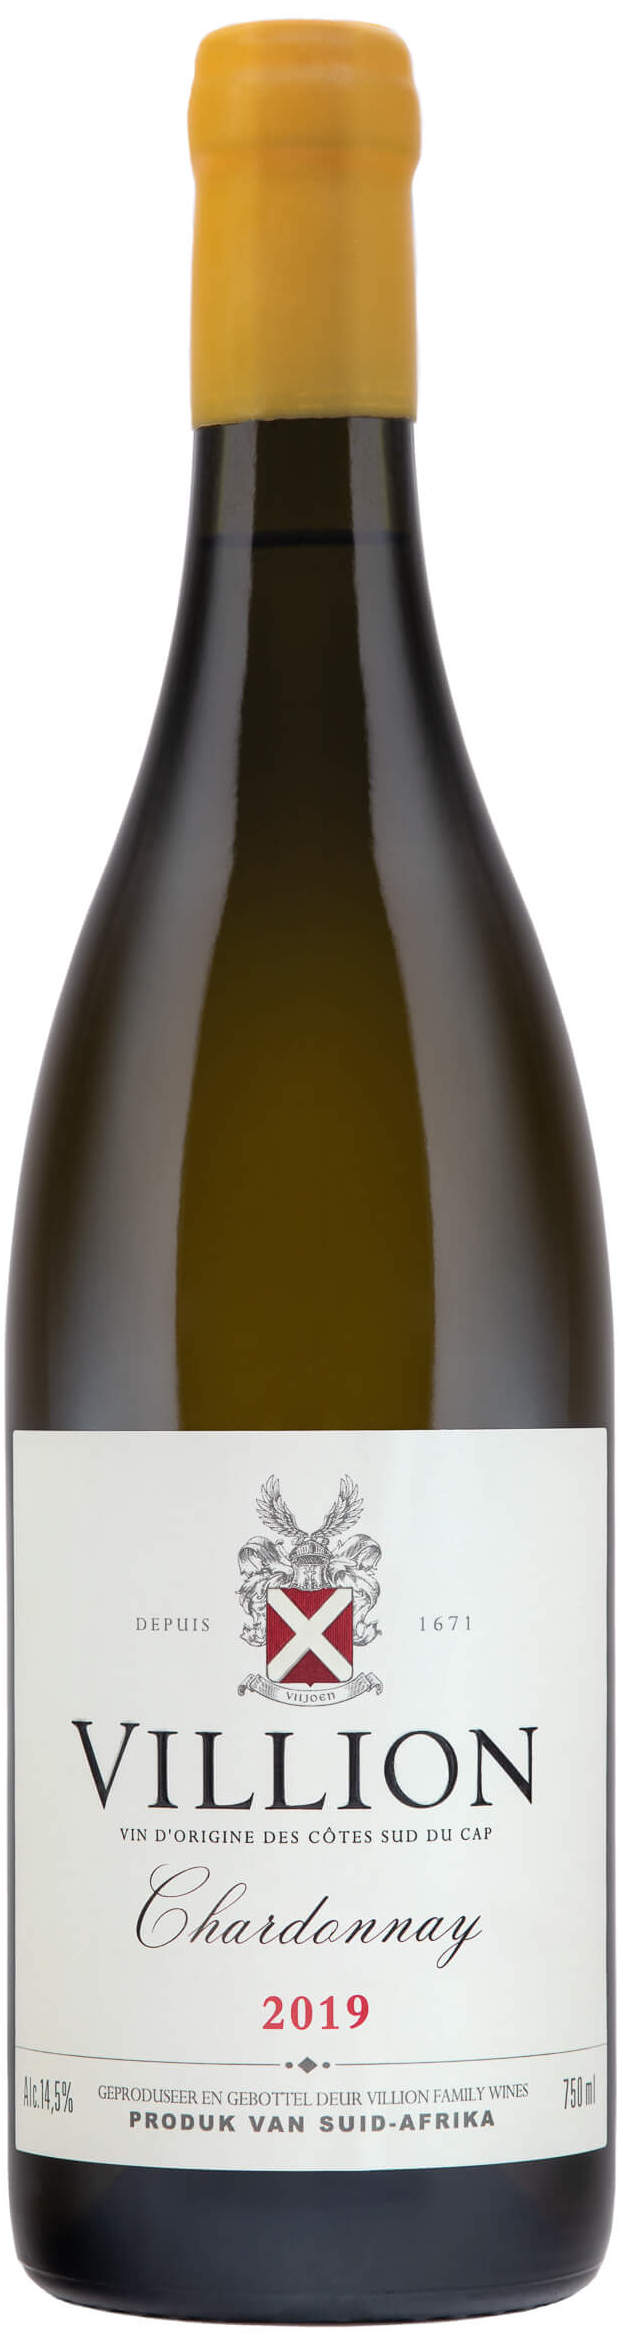 Villion Chardonnay 2019